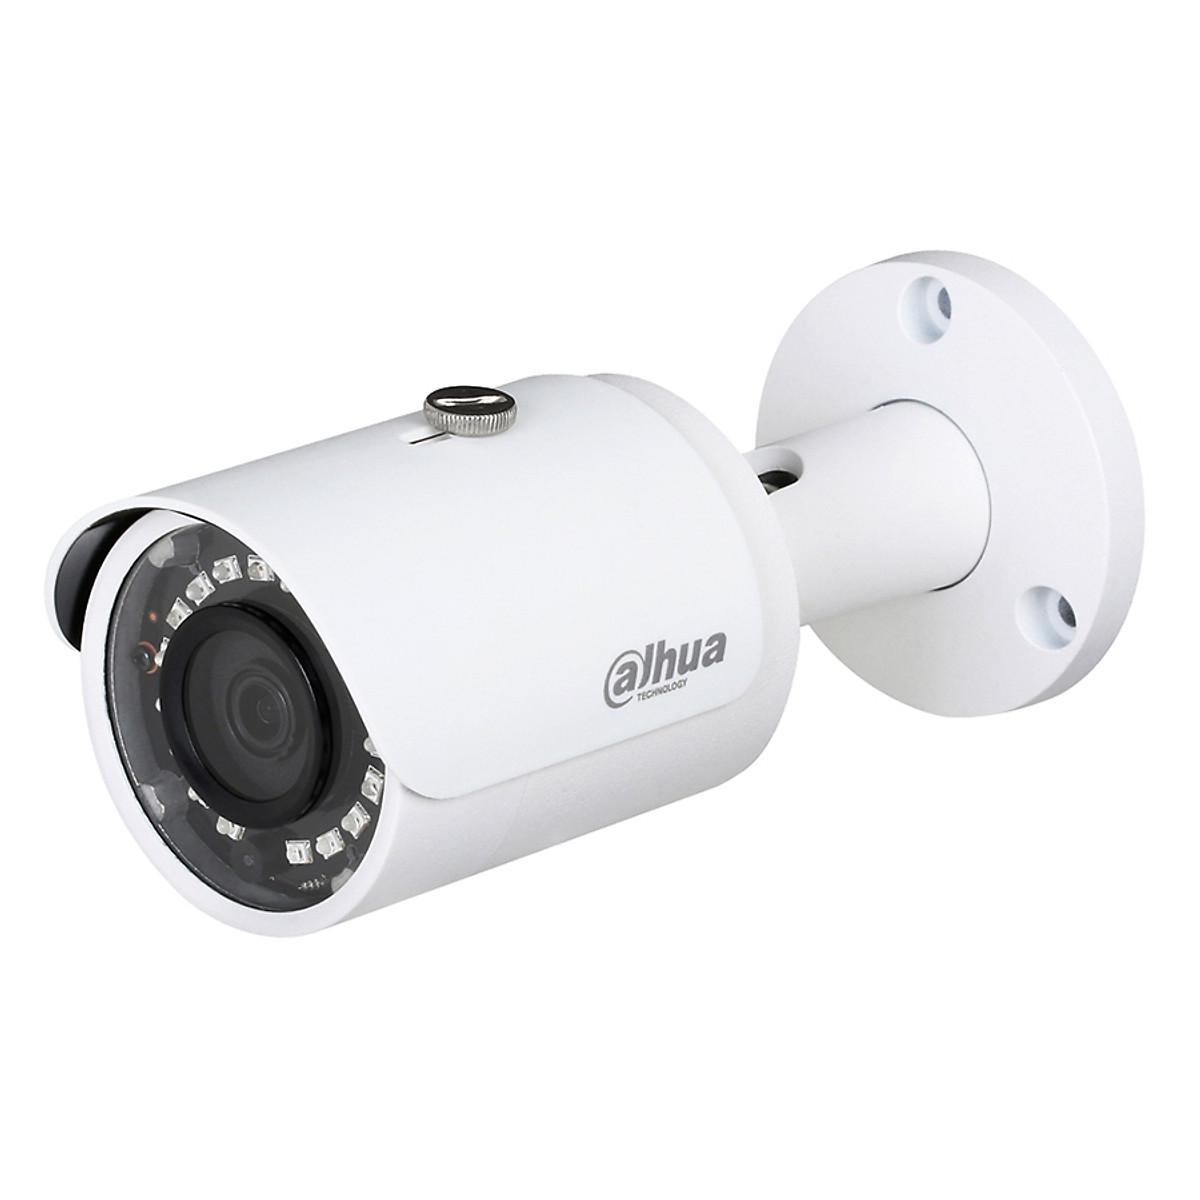 Camera Quan Sát CVI Dahua HAC-HFW1000SP-S3 – Hàng Chính Hãng